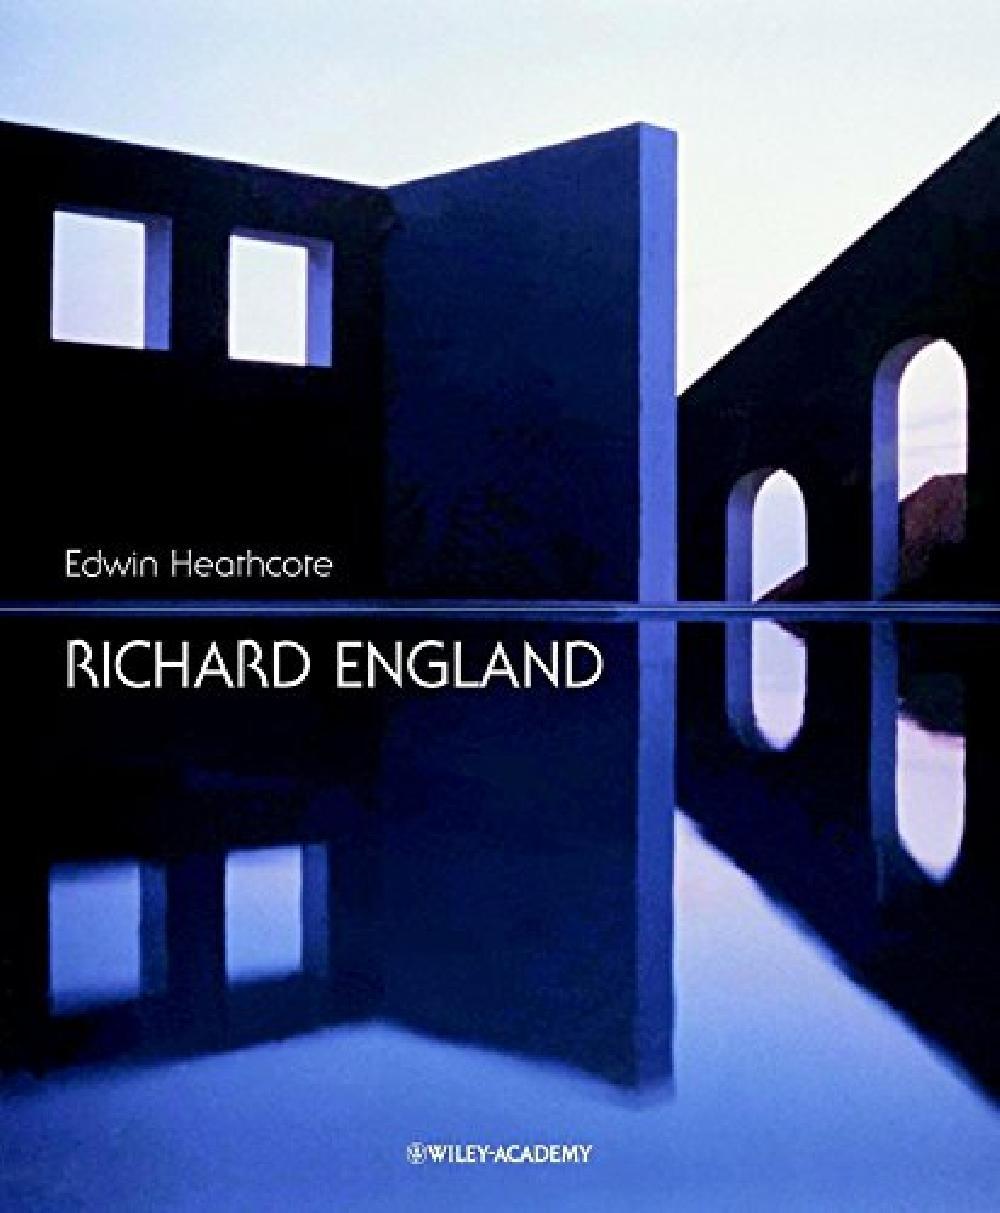 Richard England